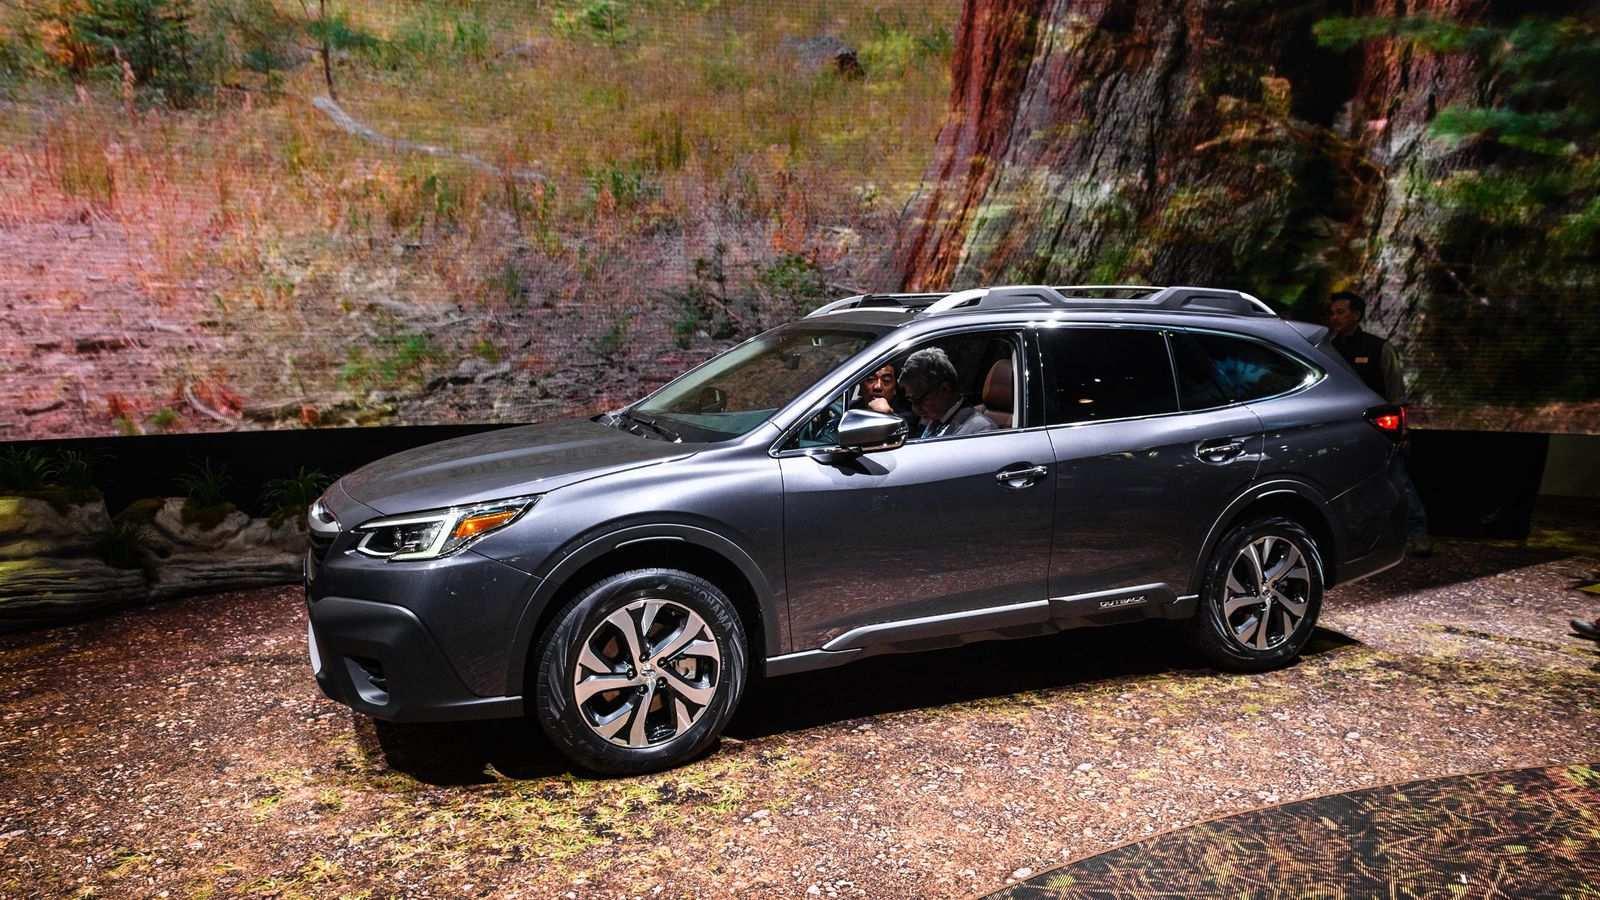 63 Gallery of Subaru Outback 2020 Price History with Subaru Outback 2020 Price